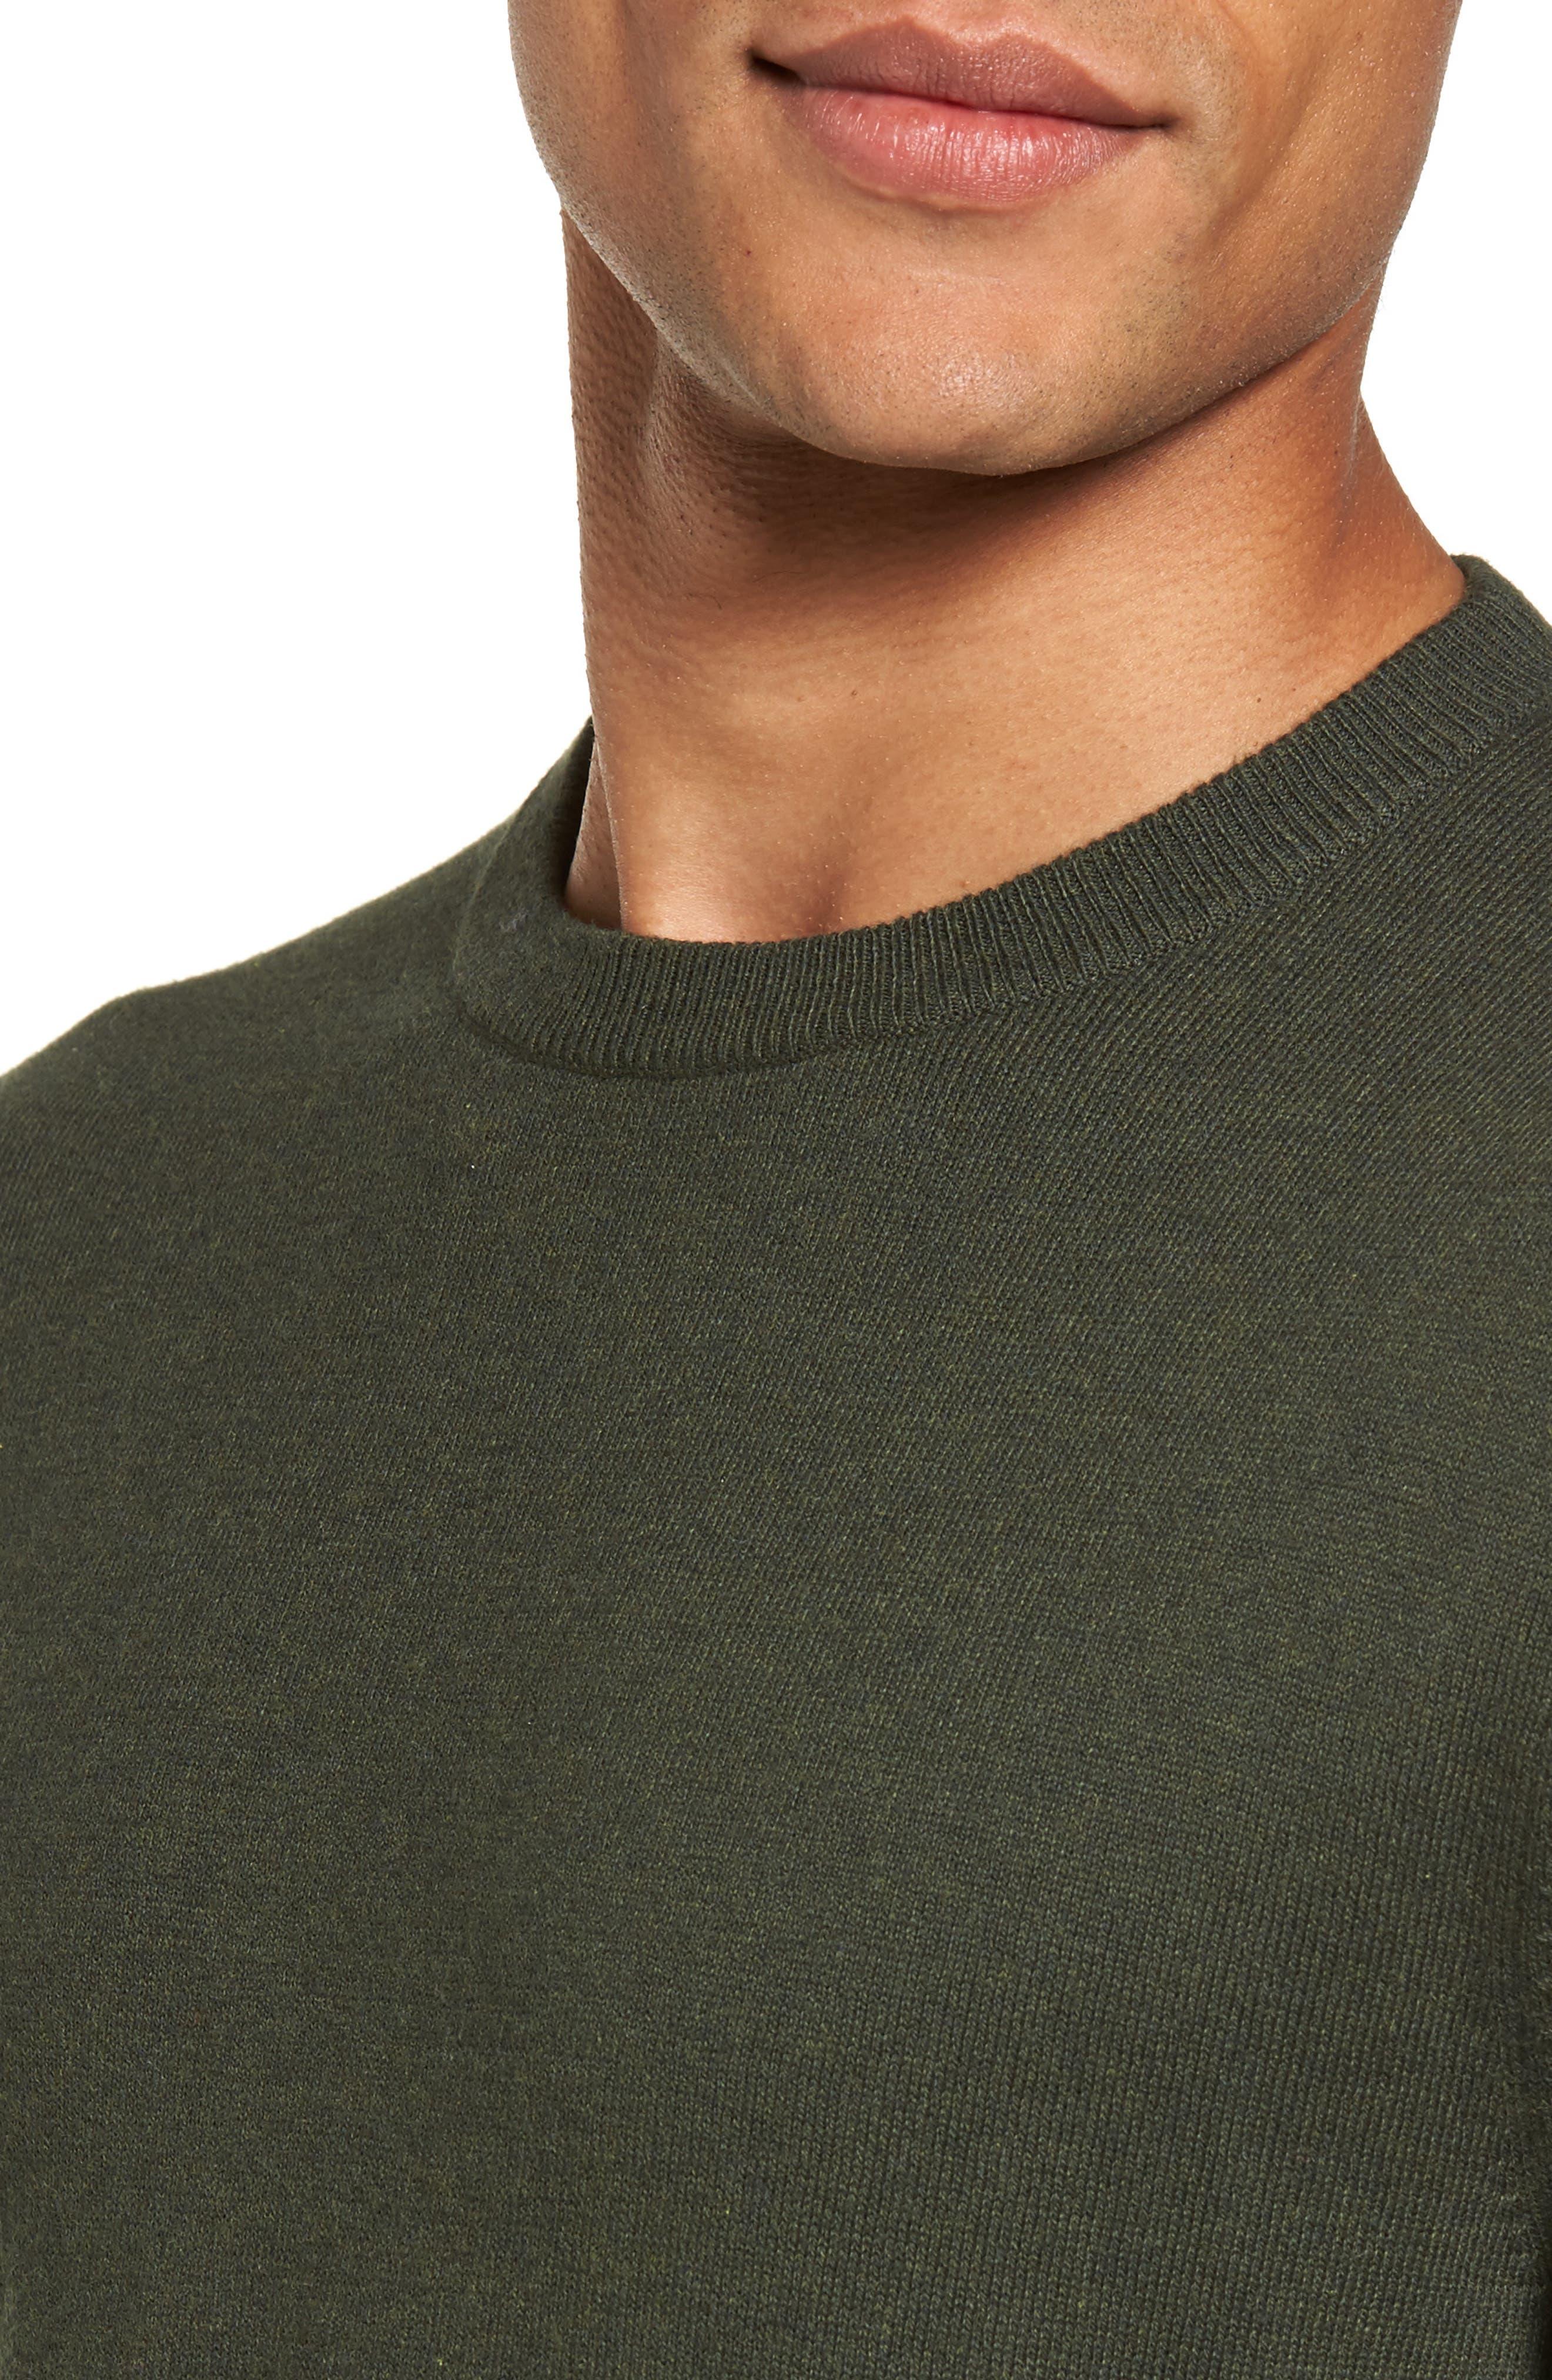 Cotton & Cashmere Crewneck Sweater,                             Alternate thumbnail 4, color,                             Green Deep Pine